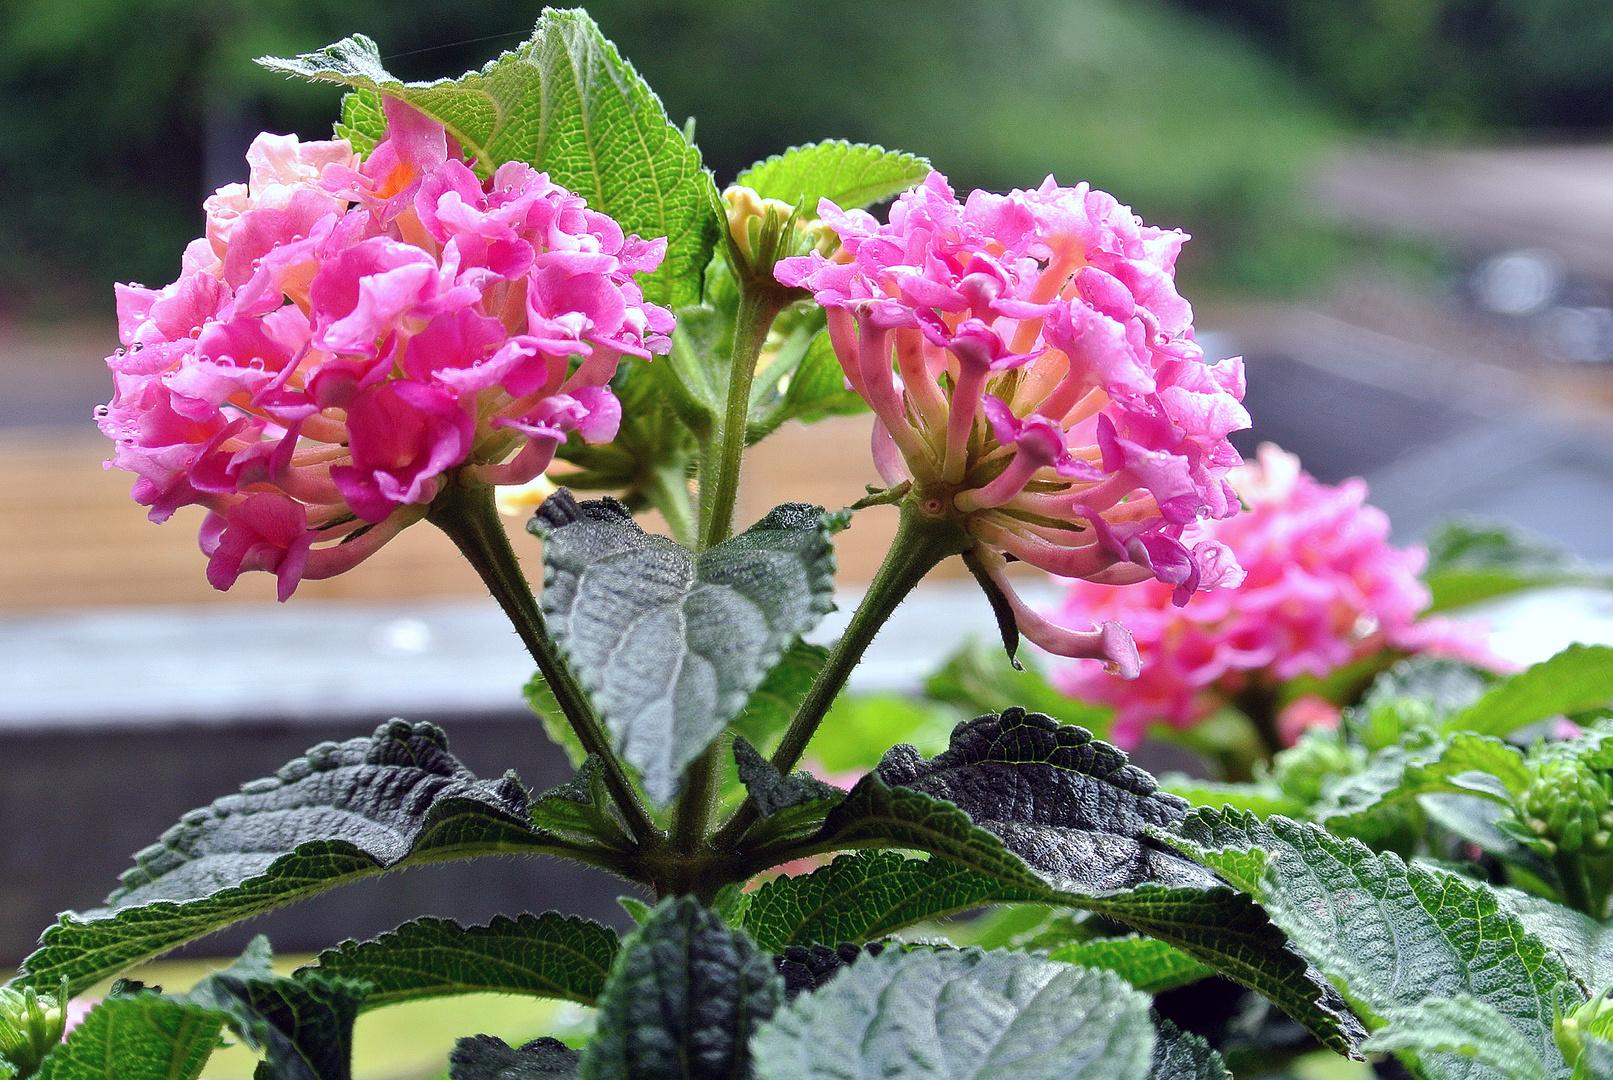 Balkonpflanze im Regen